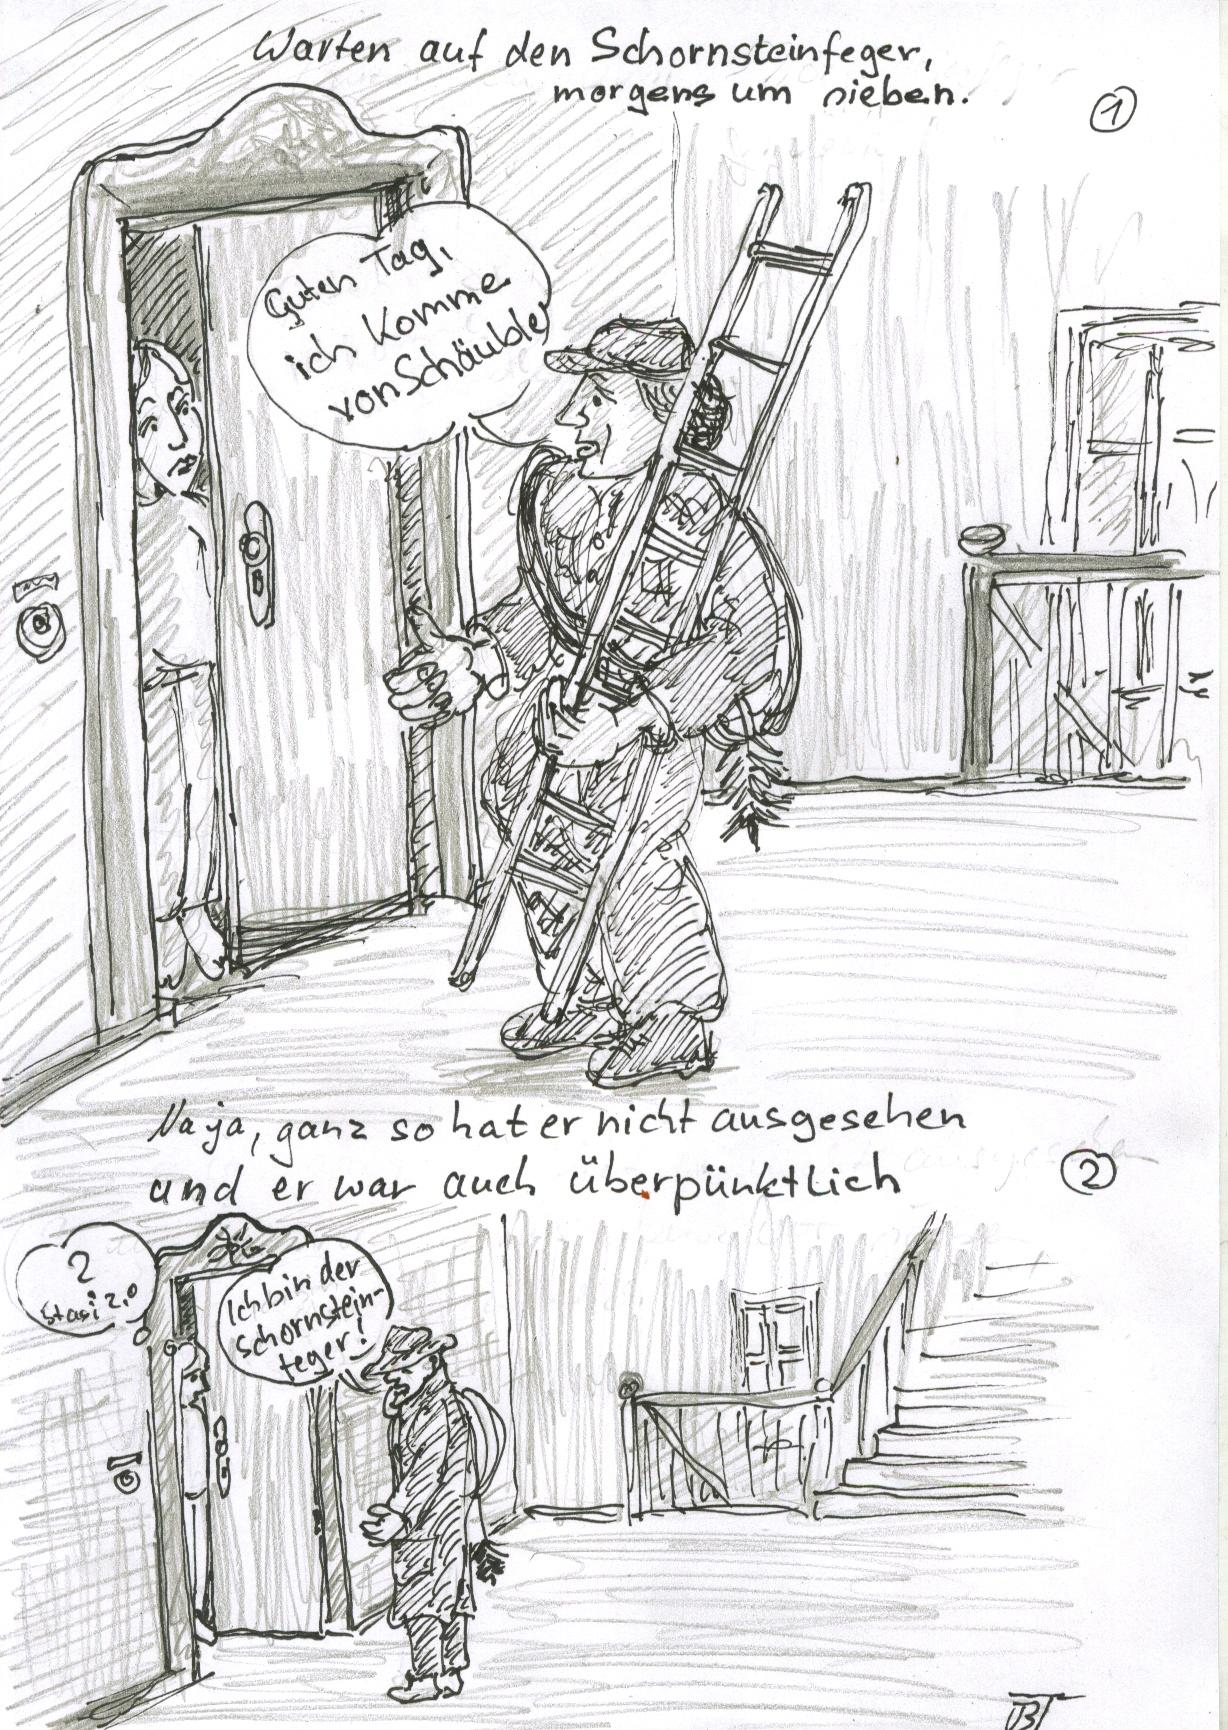 kaminkehrer schornsteinfeger cartoons schornsteinfeger oft nutzlos. Black Bedroom Furniture Sets. Home Design Ideas